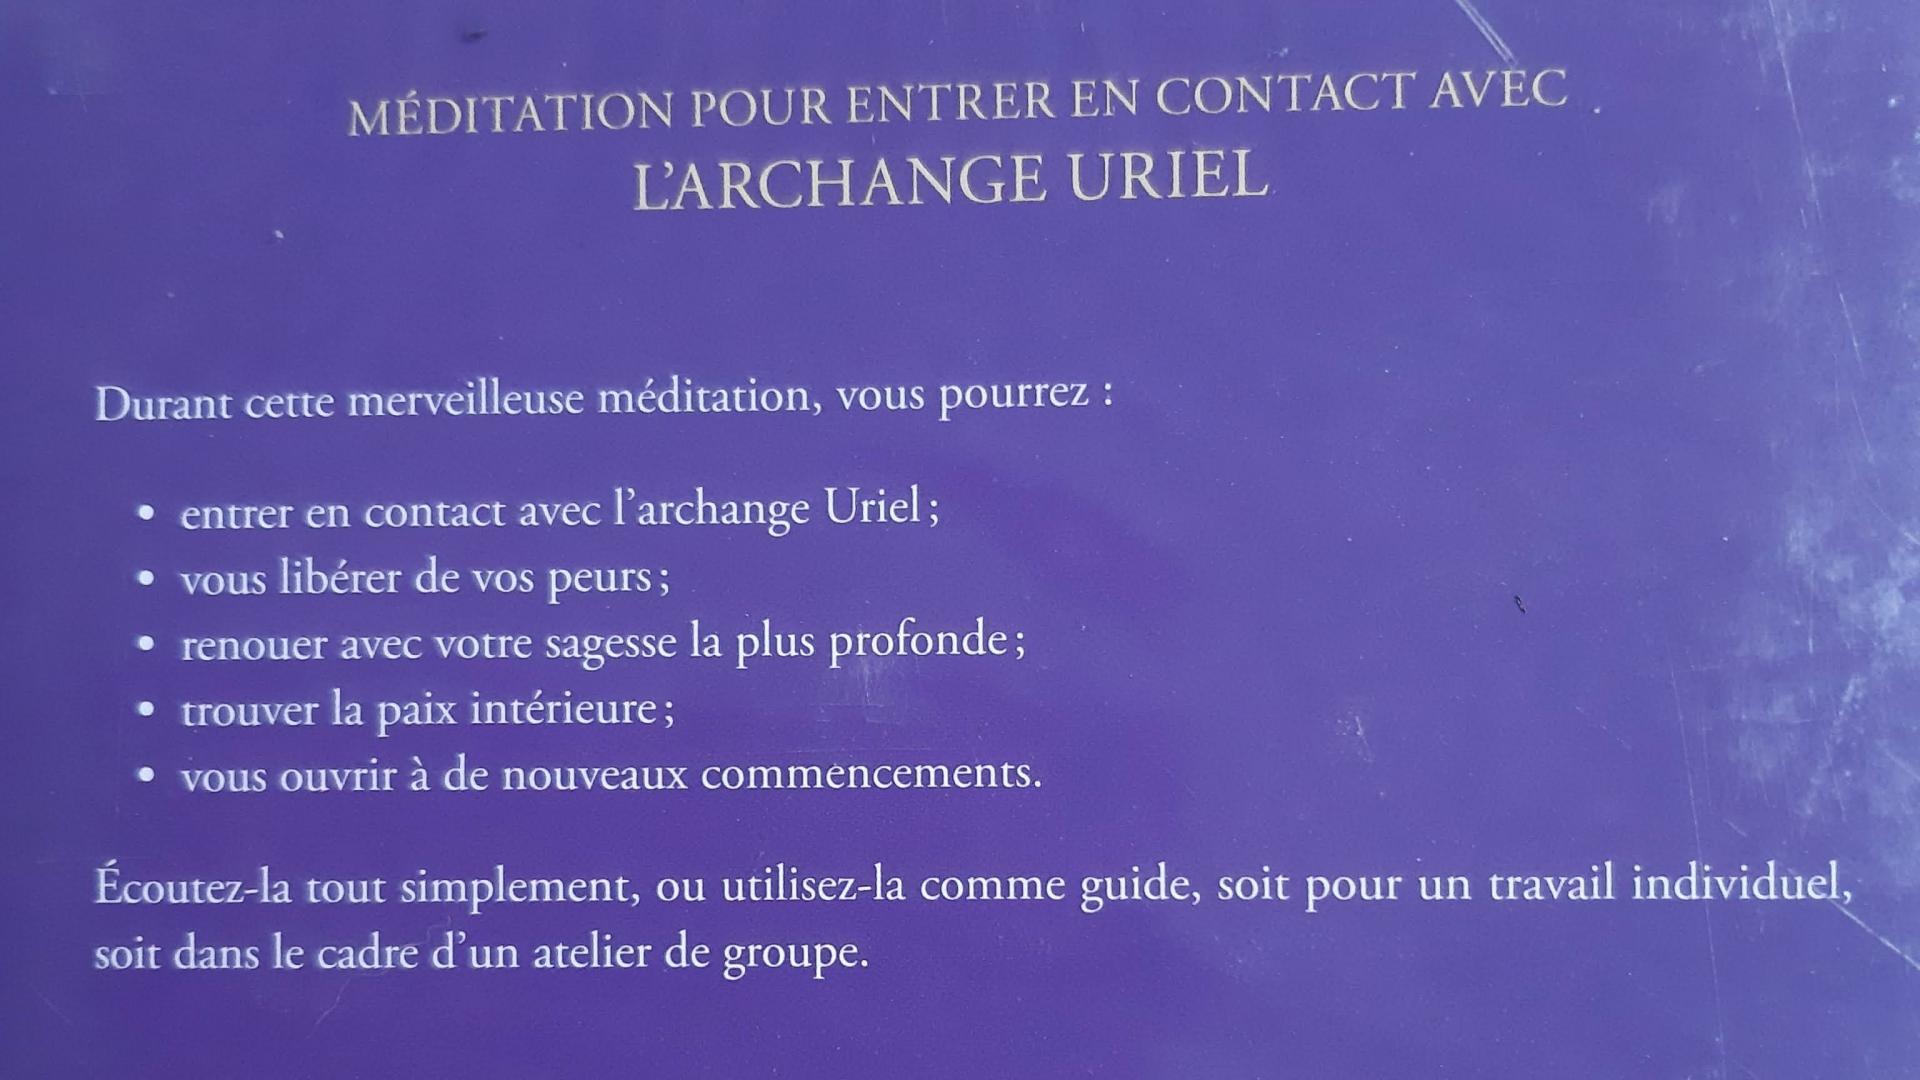 MEDITATION DE L'ARCHANGE URIEL DE DIANA COOPER